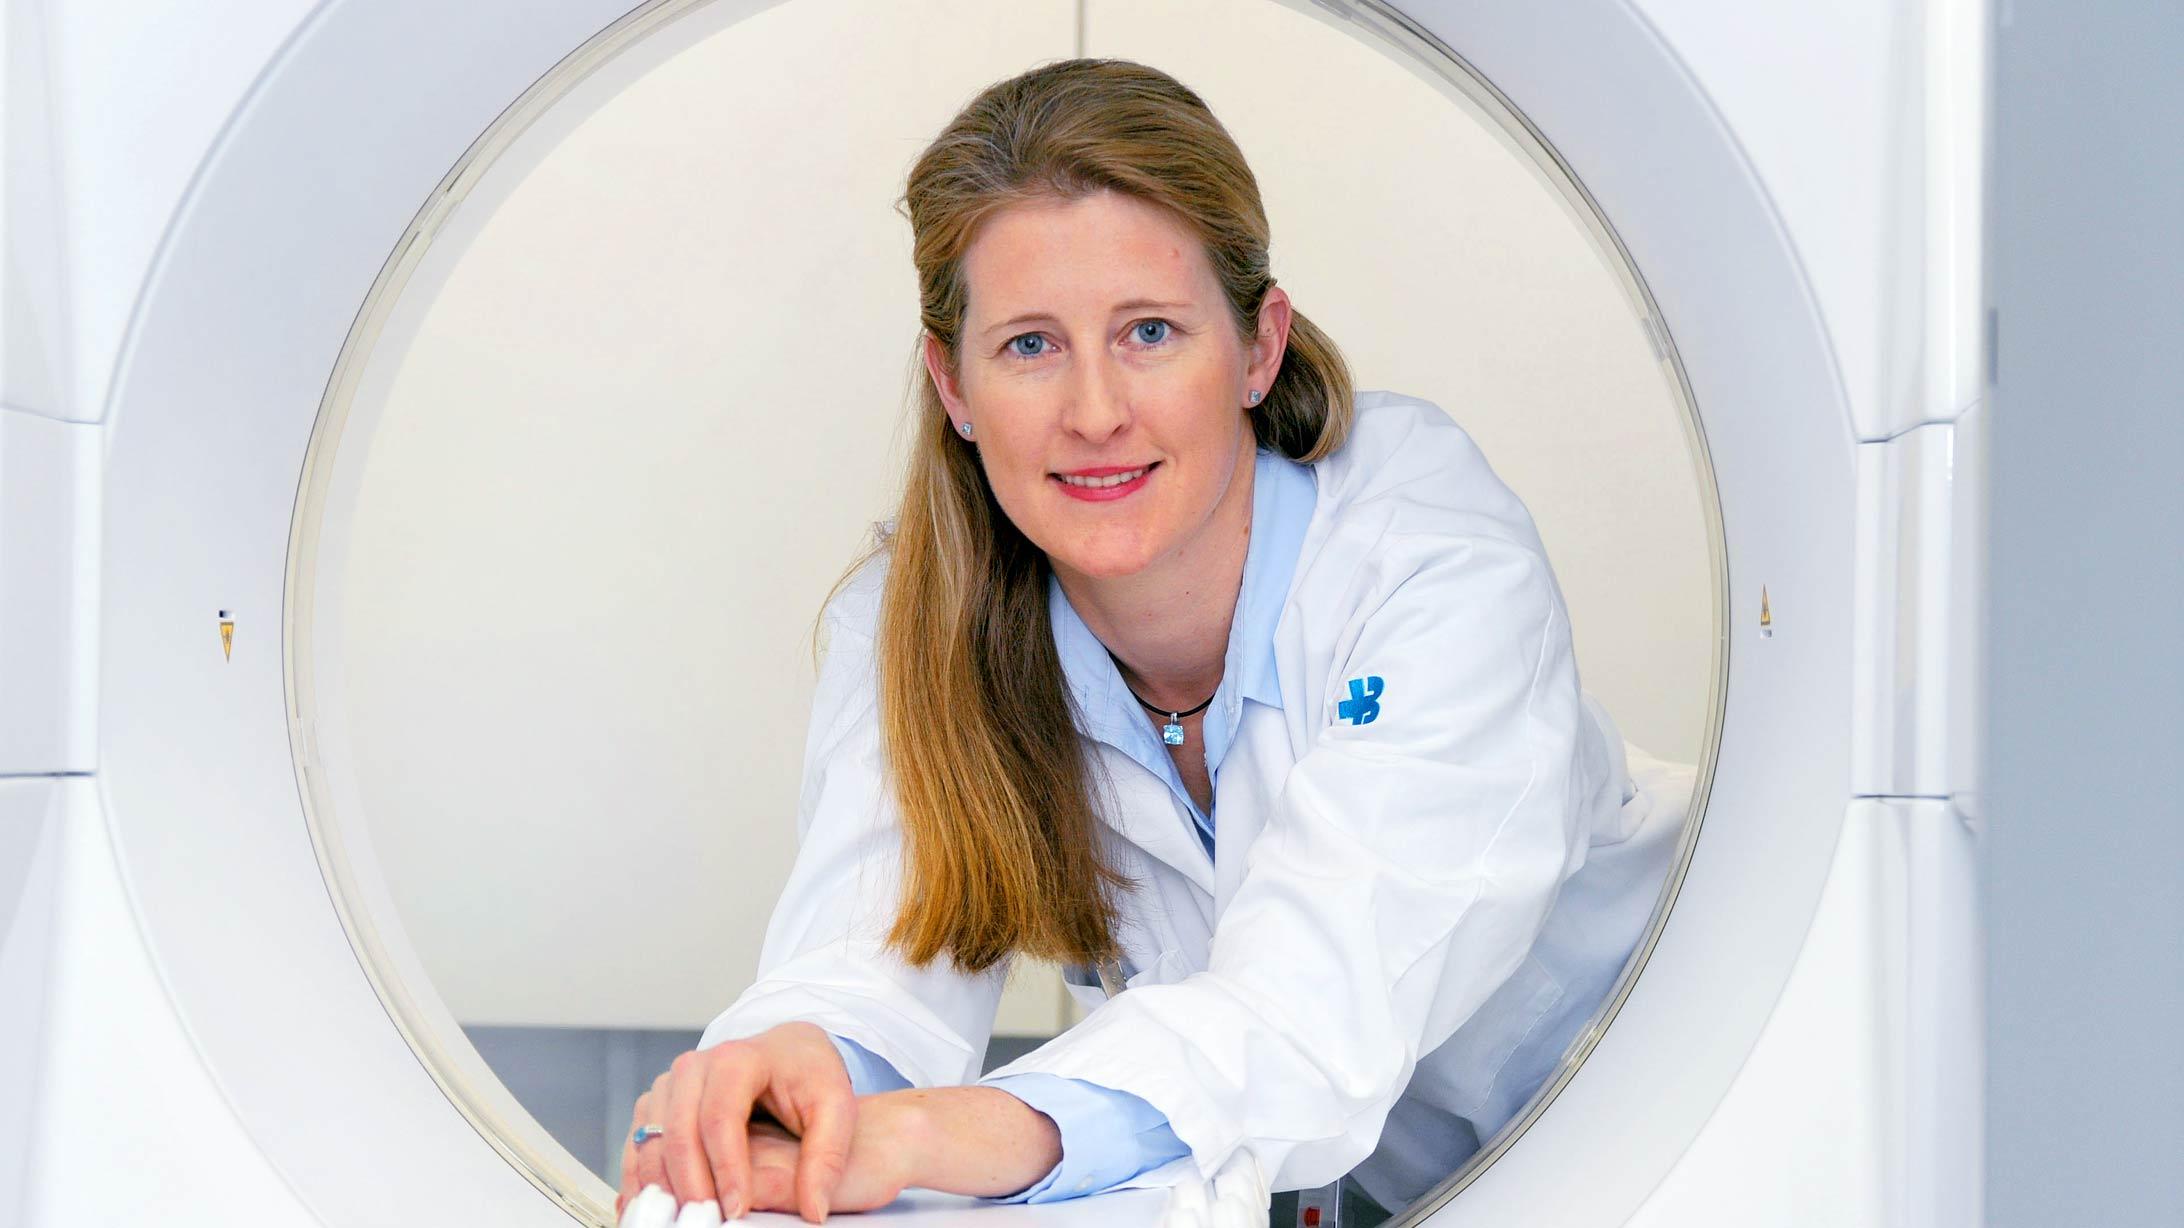 Irene Burger ist Chefärztin Nuklearmedizin am KSB